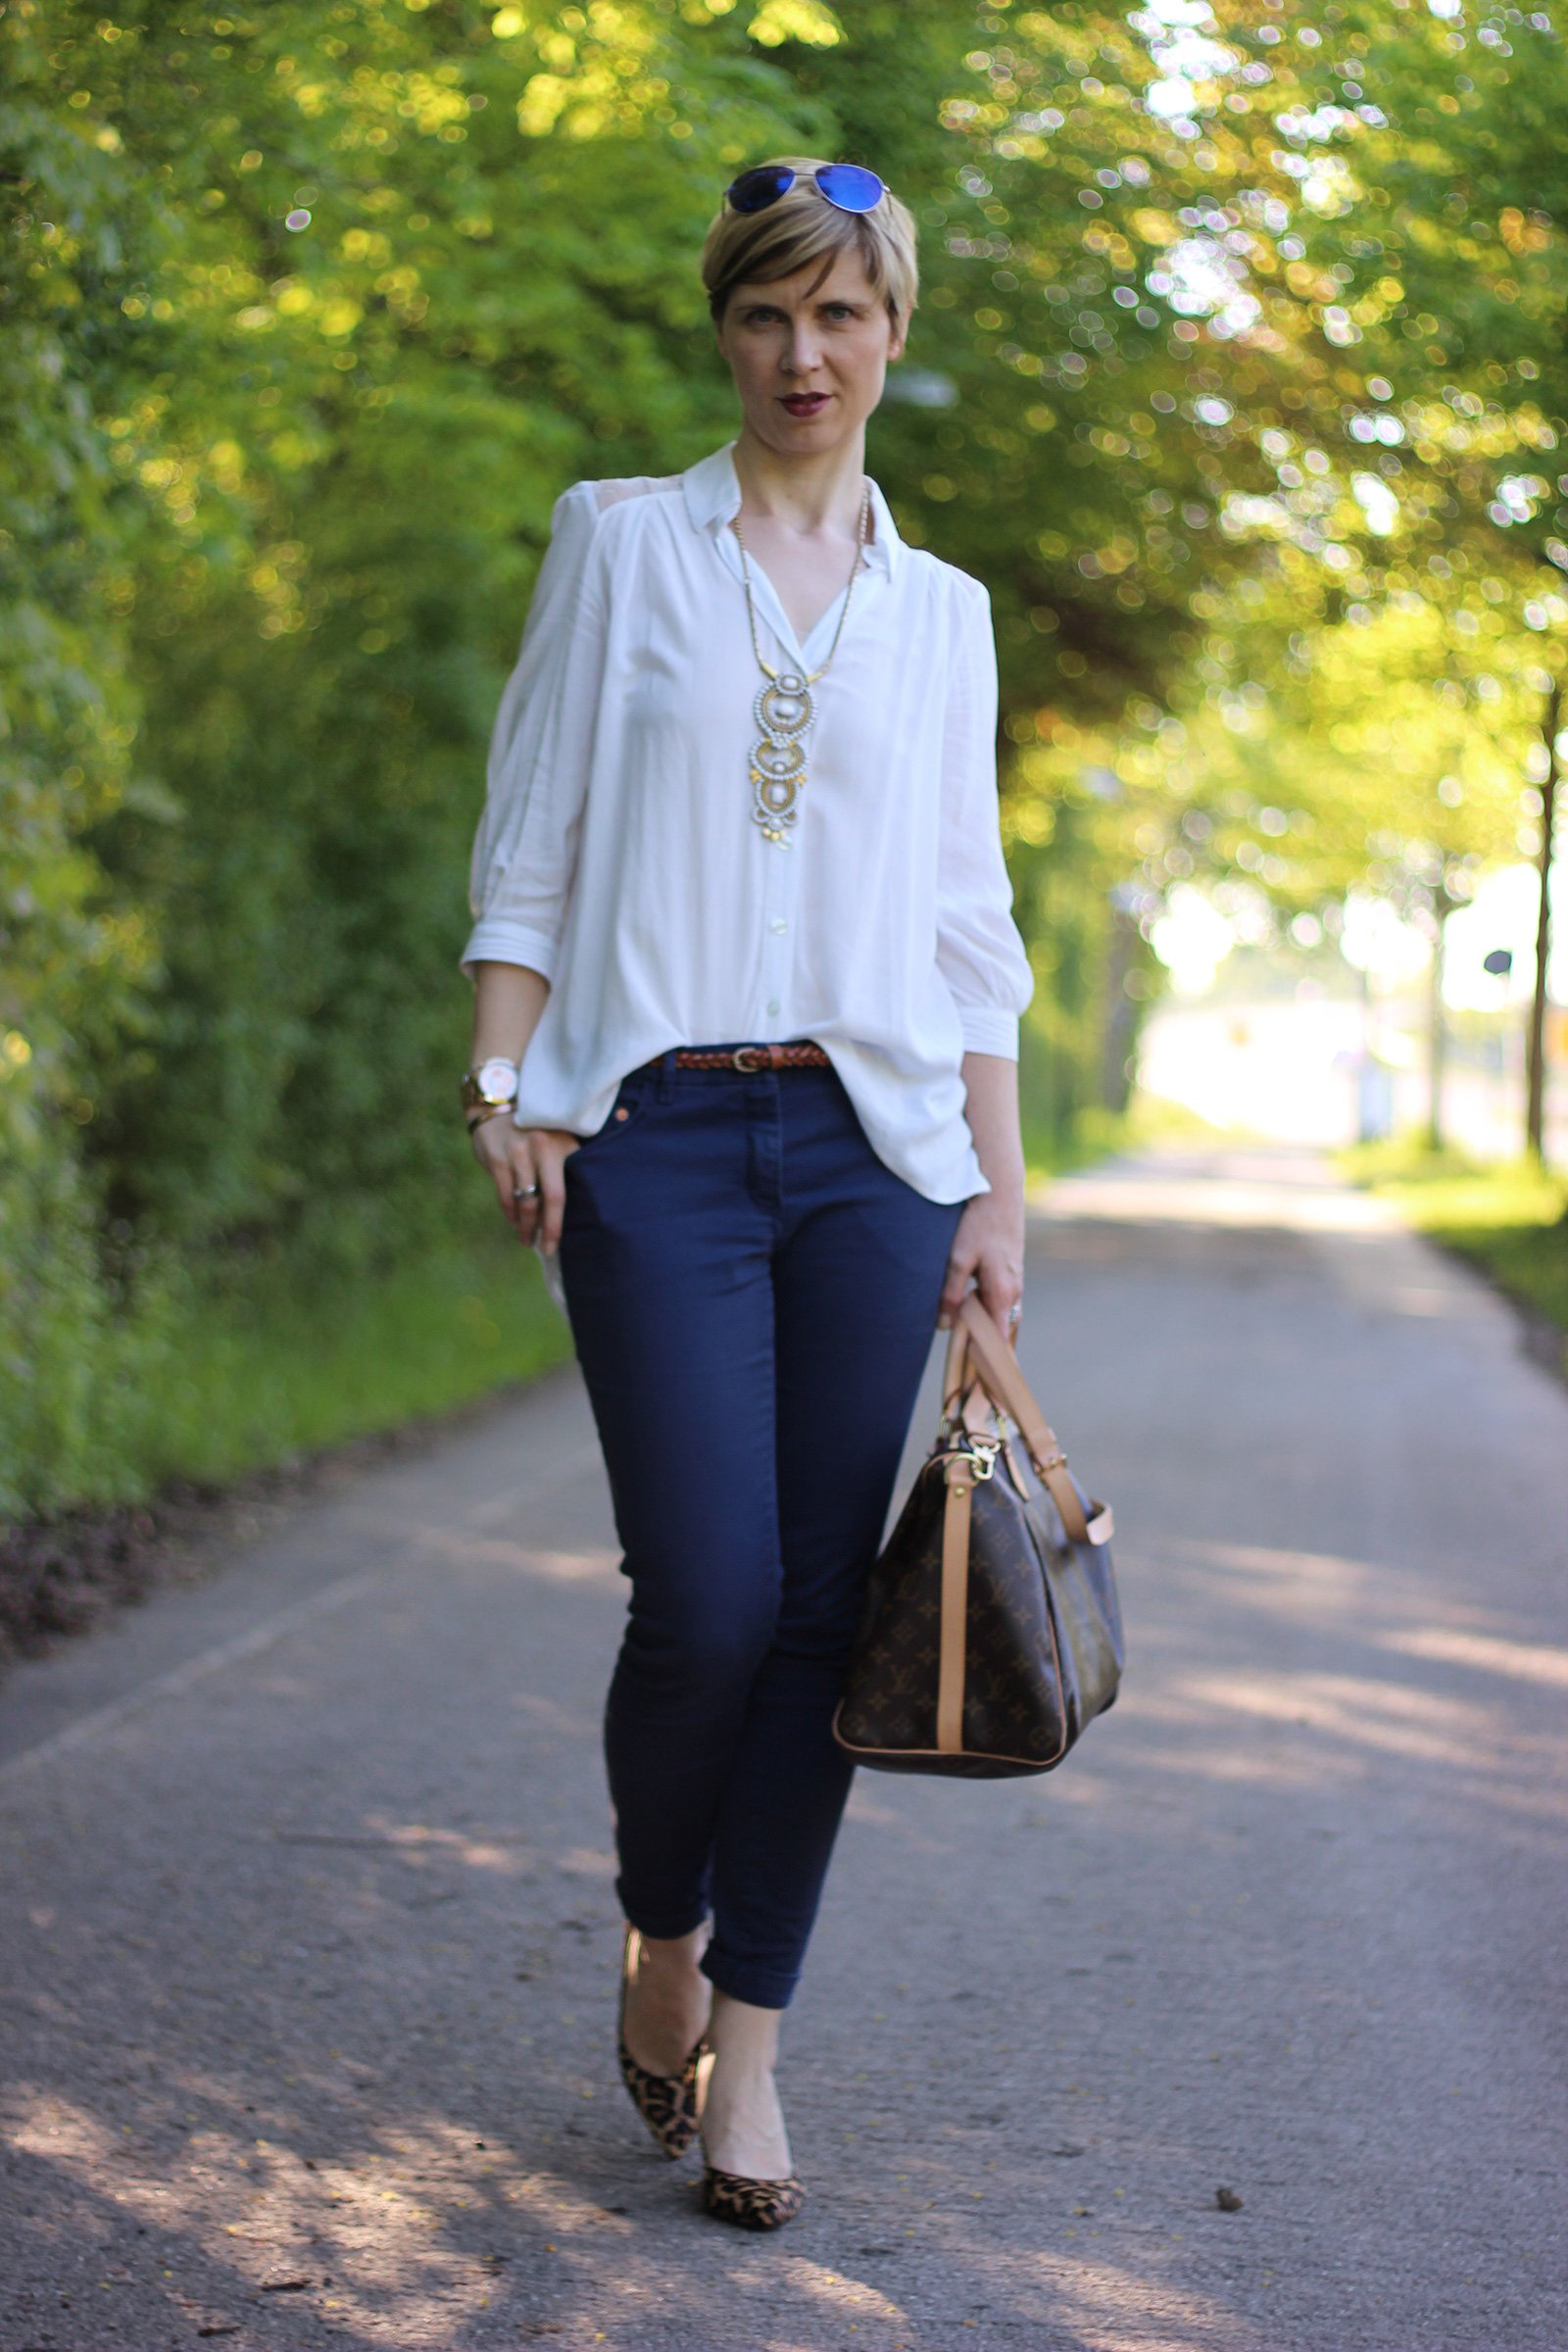 IMG_4122a_leo_leopumps_blue_blau_Lace_Spitze_Bluse_Stellaanddot_Outfit_AHemadundaHos_Conny_Fashion_Modeblog_Escada